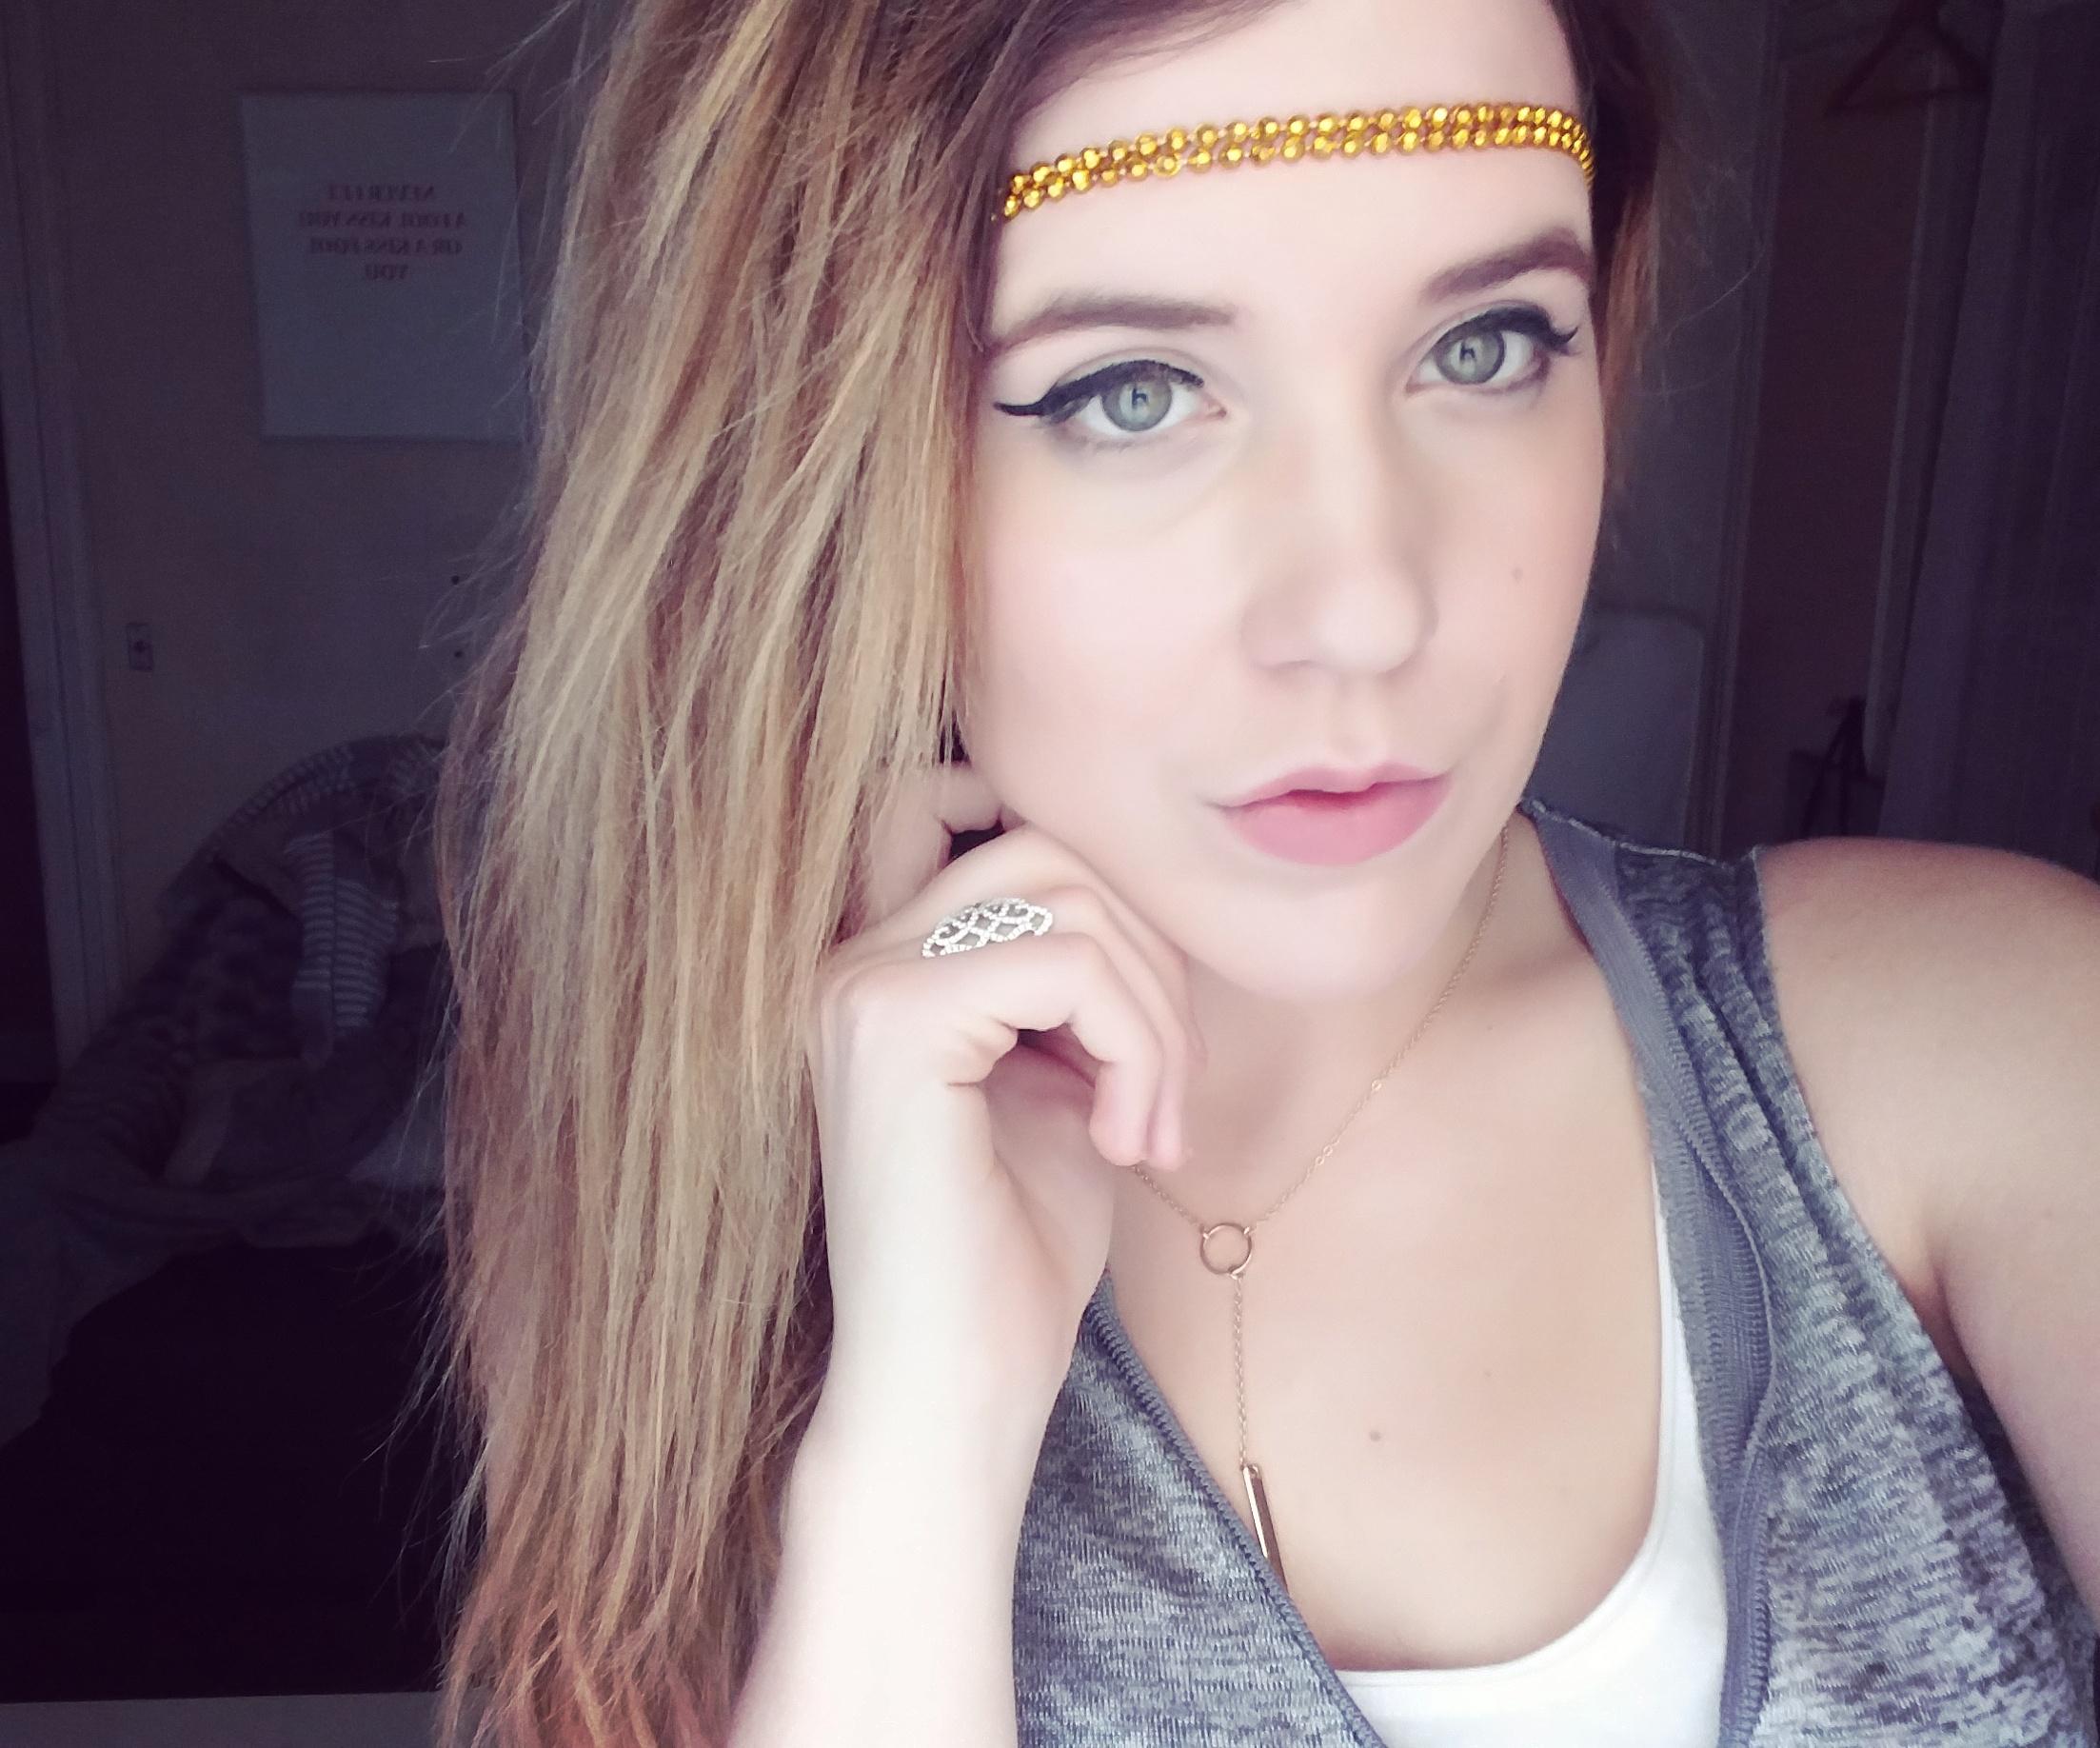 headband tuto cheveux coiffure accessoire hair blog conseils comment coiffer